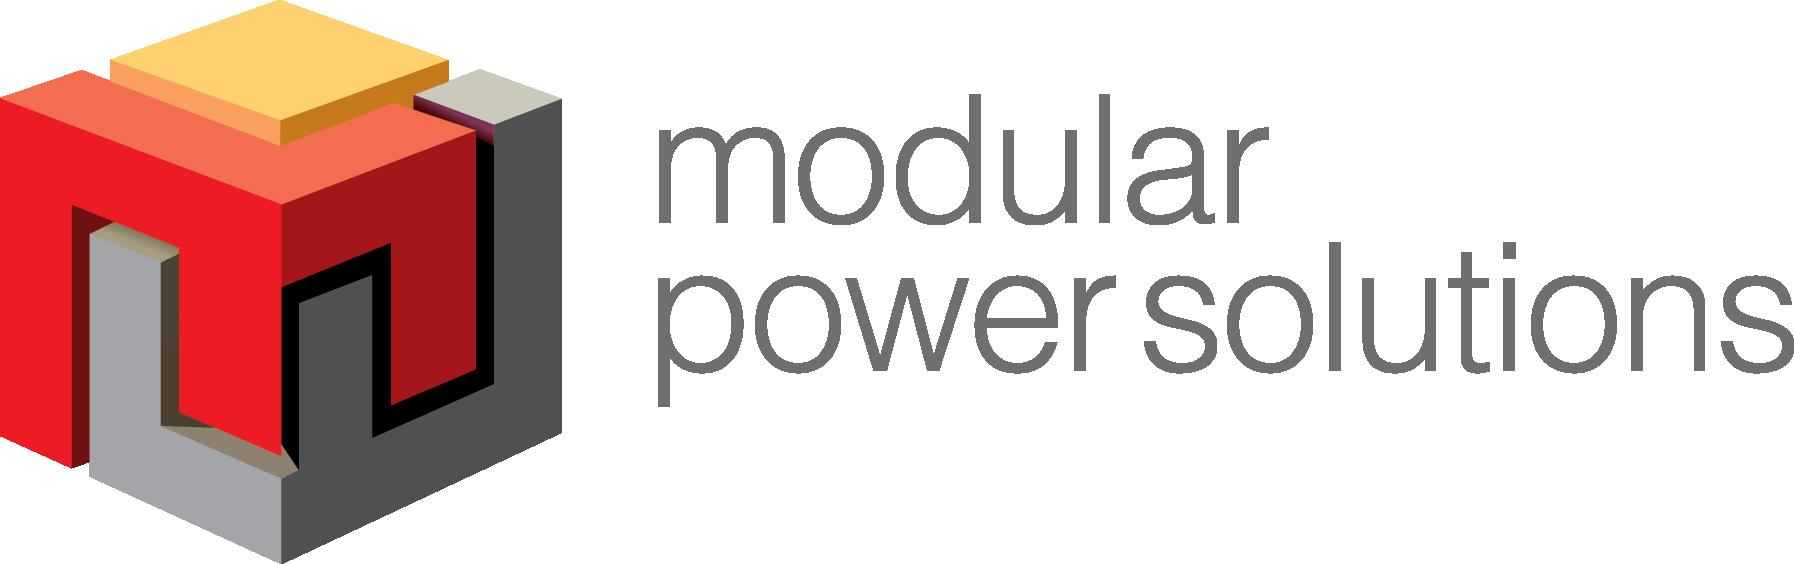 Modular Power Solutions